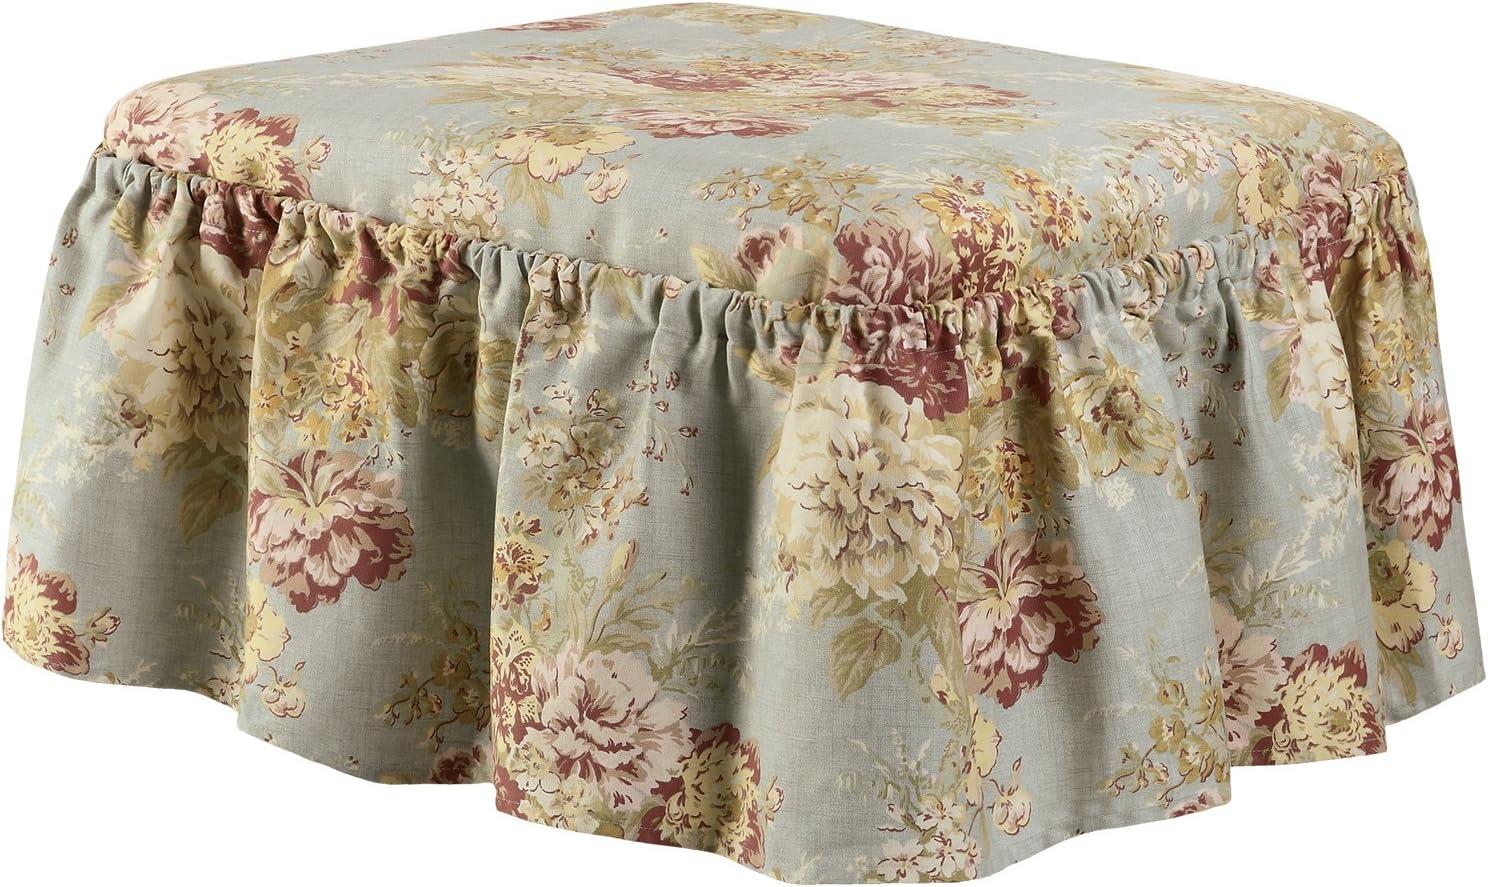 SURE FIT Ballad Bouquet Ottoman Cover Robins Egg SF4475